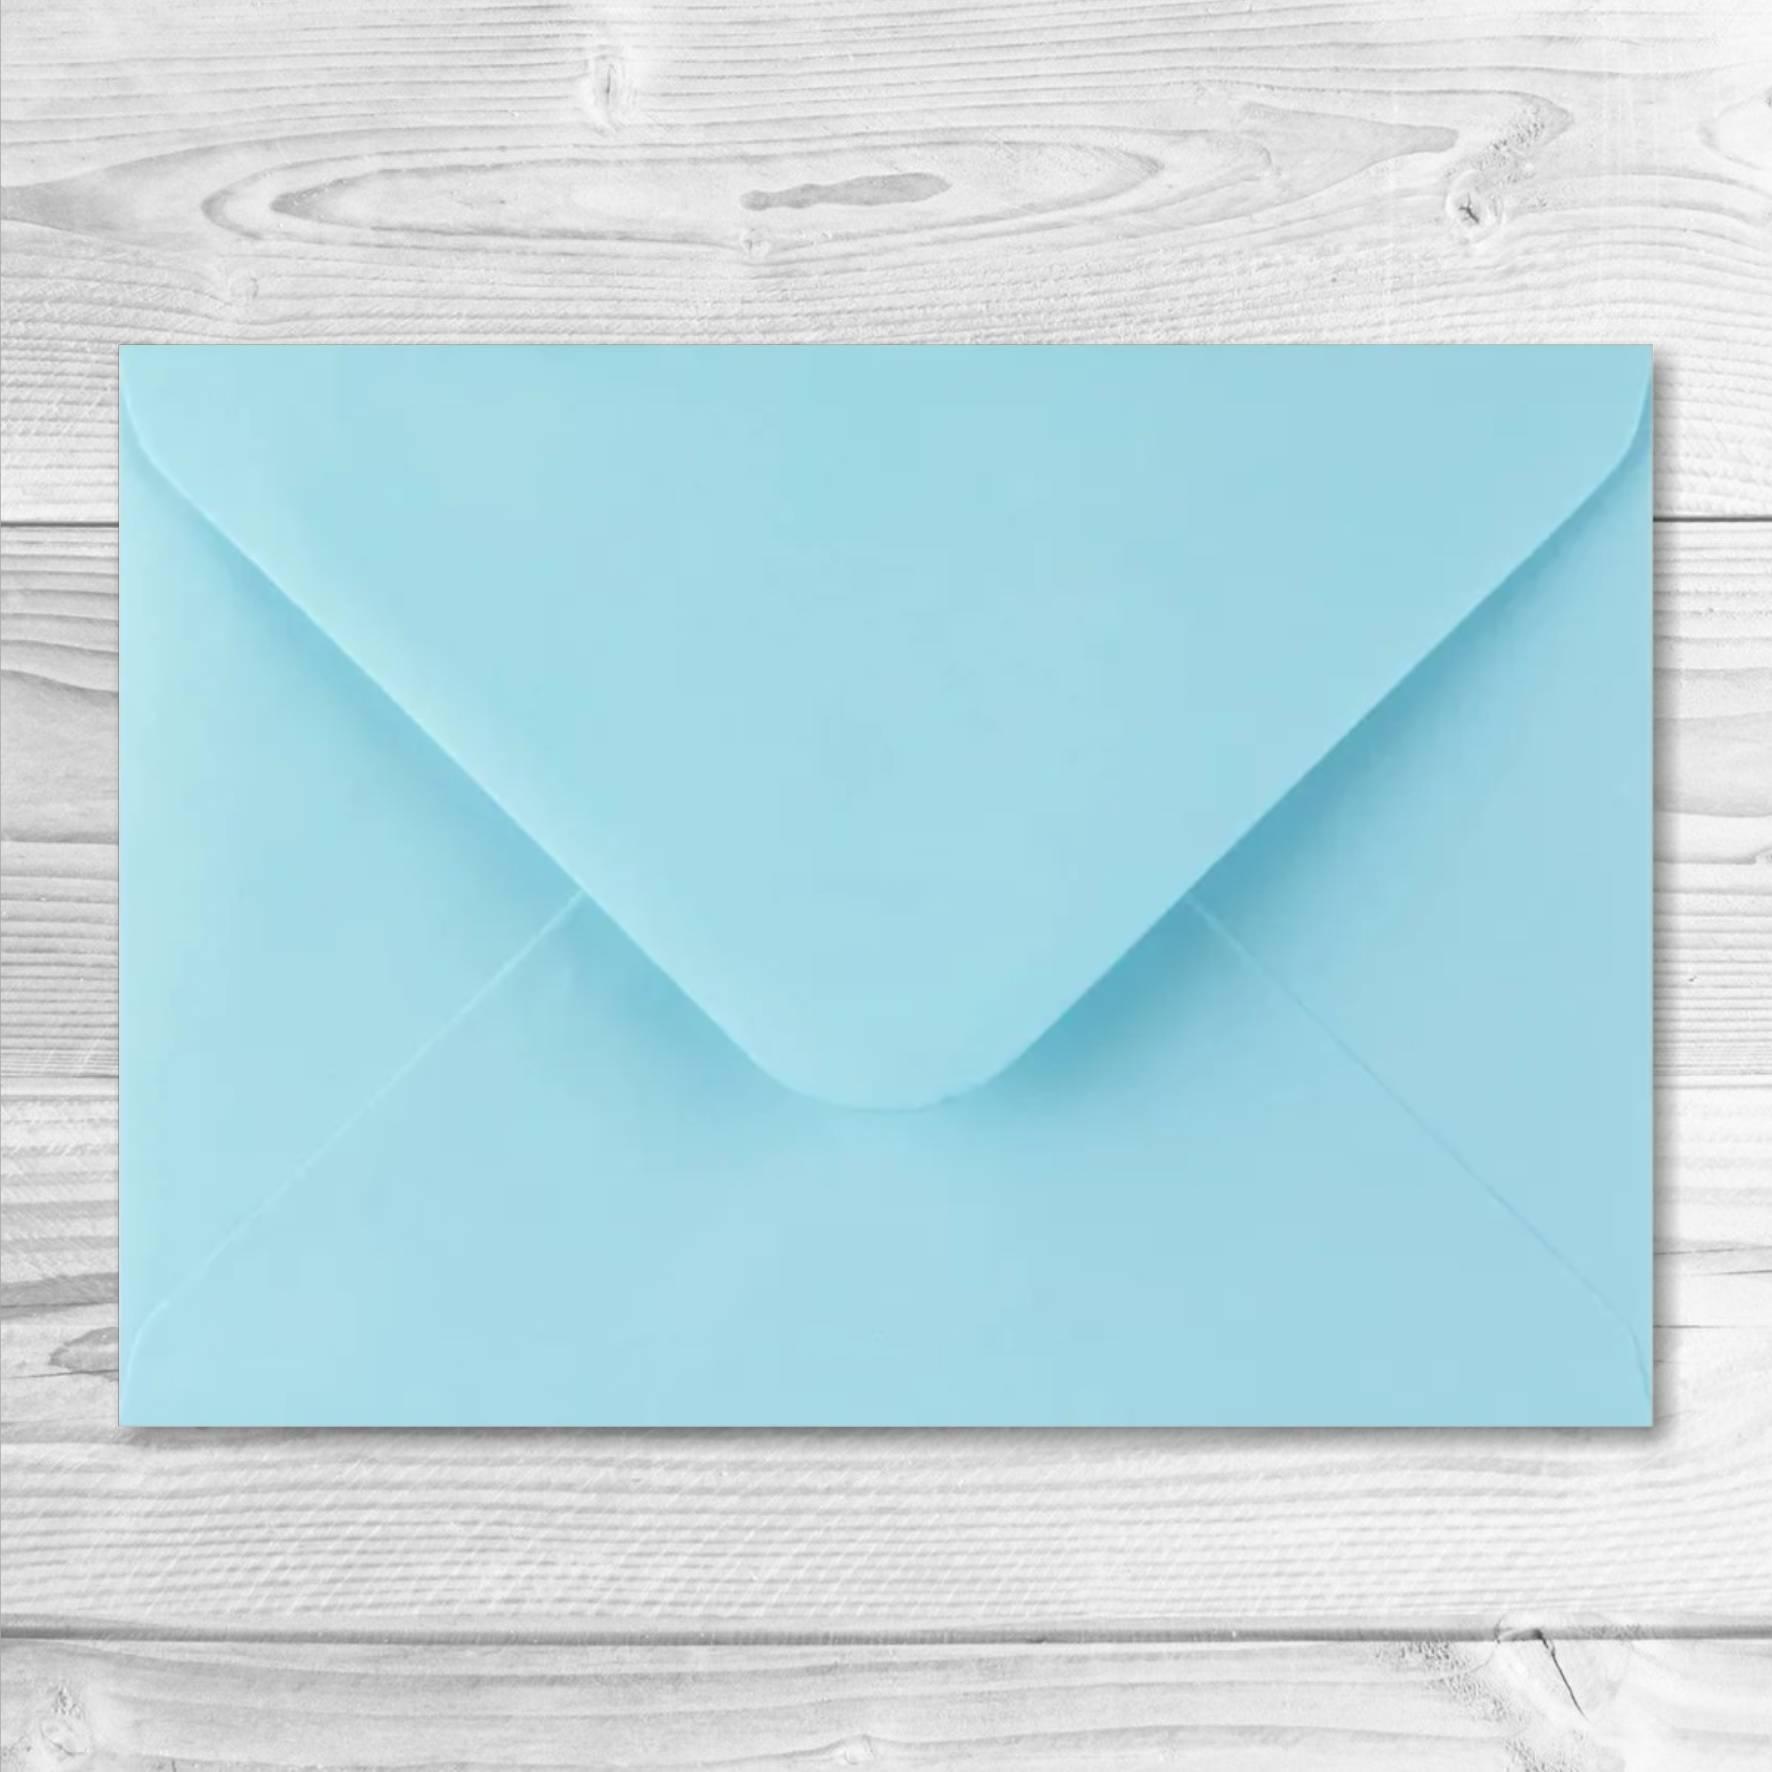 enveloppe bleu clair 13 x 19 cm